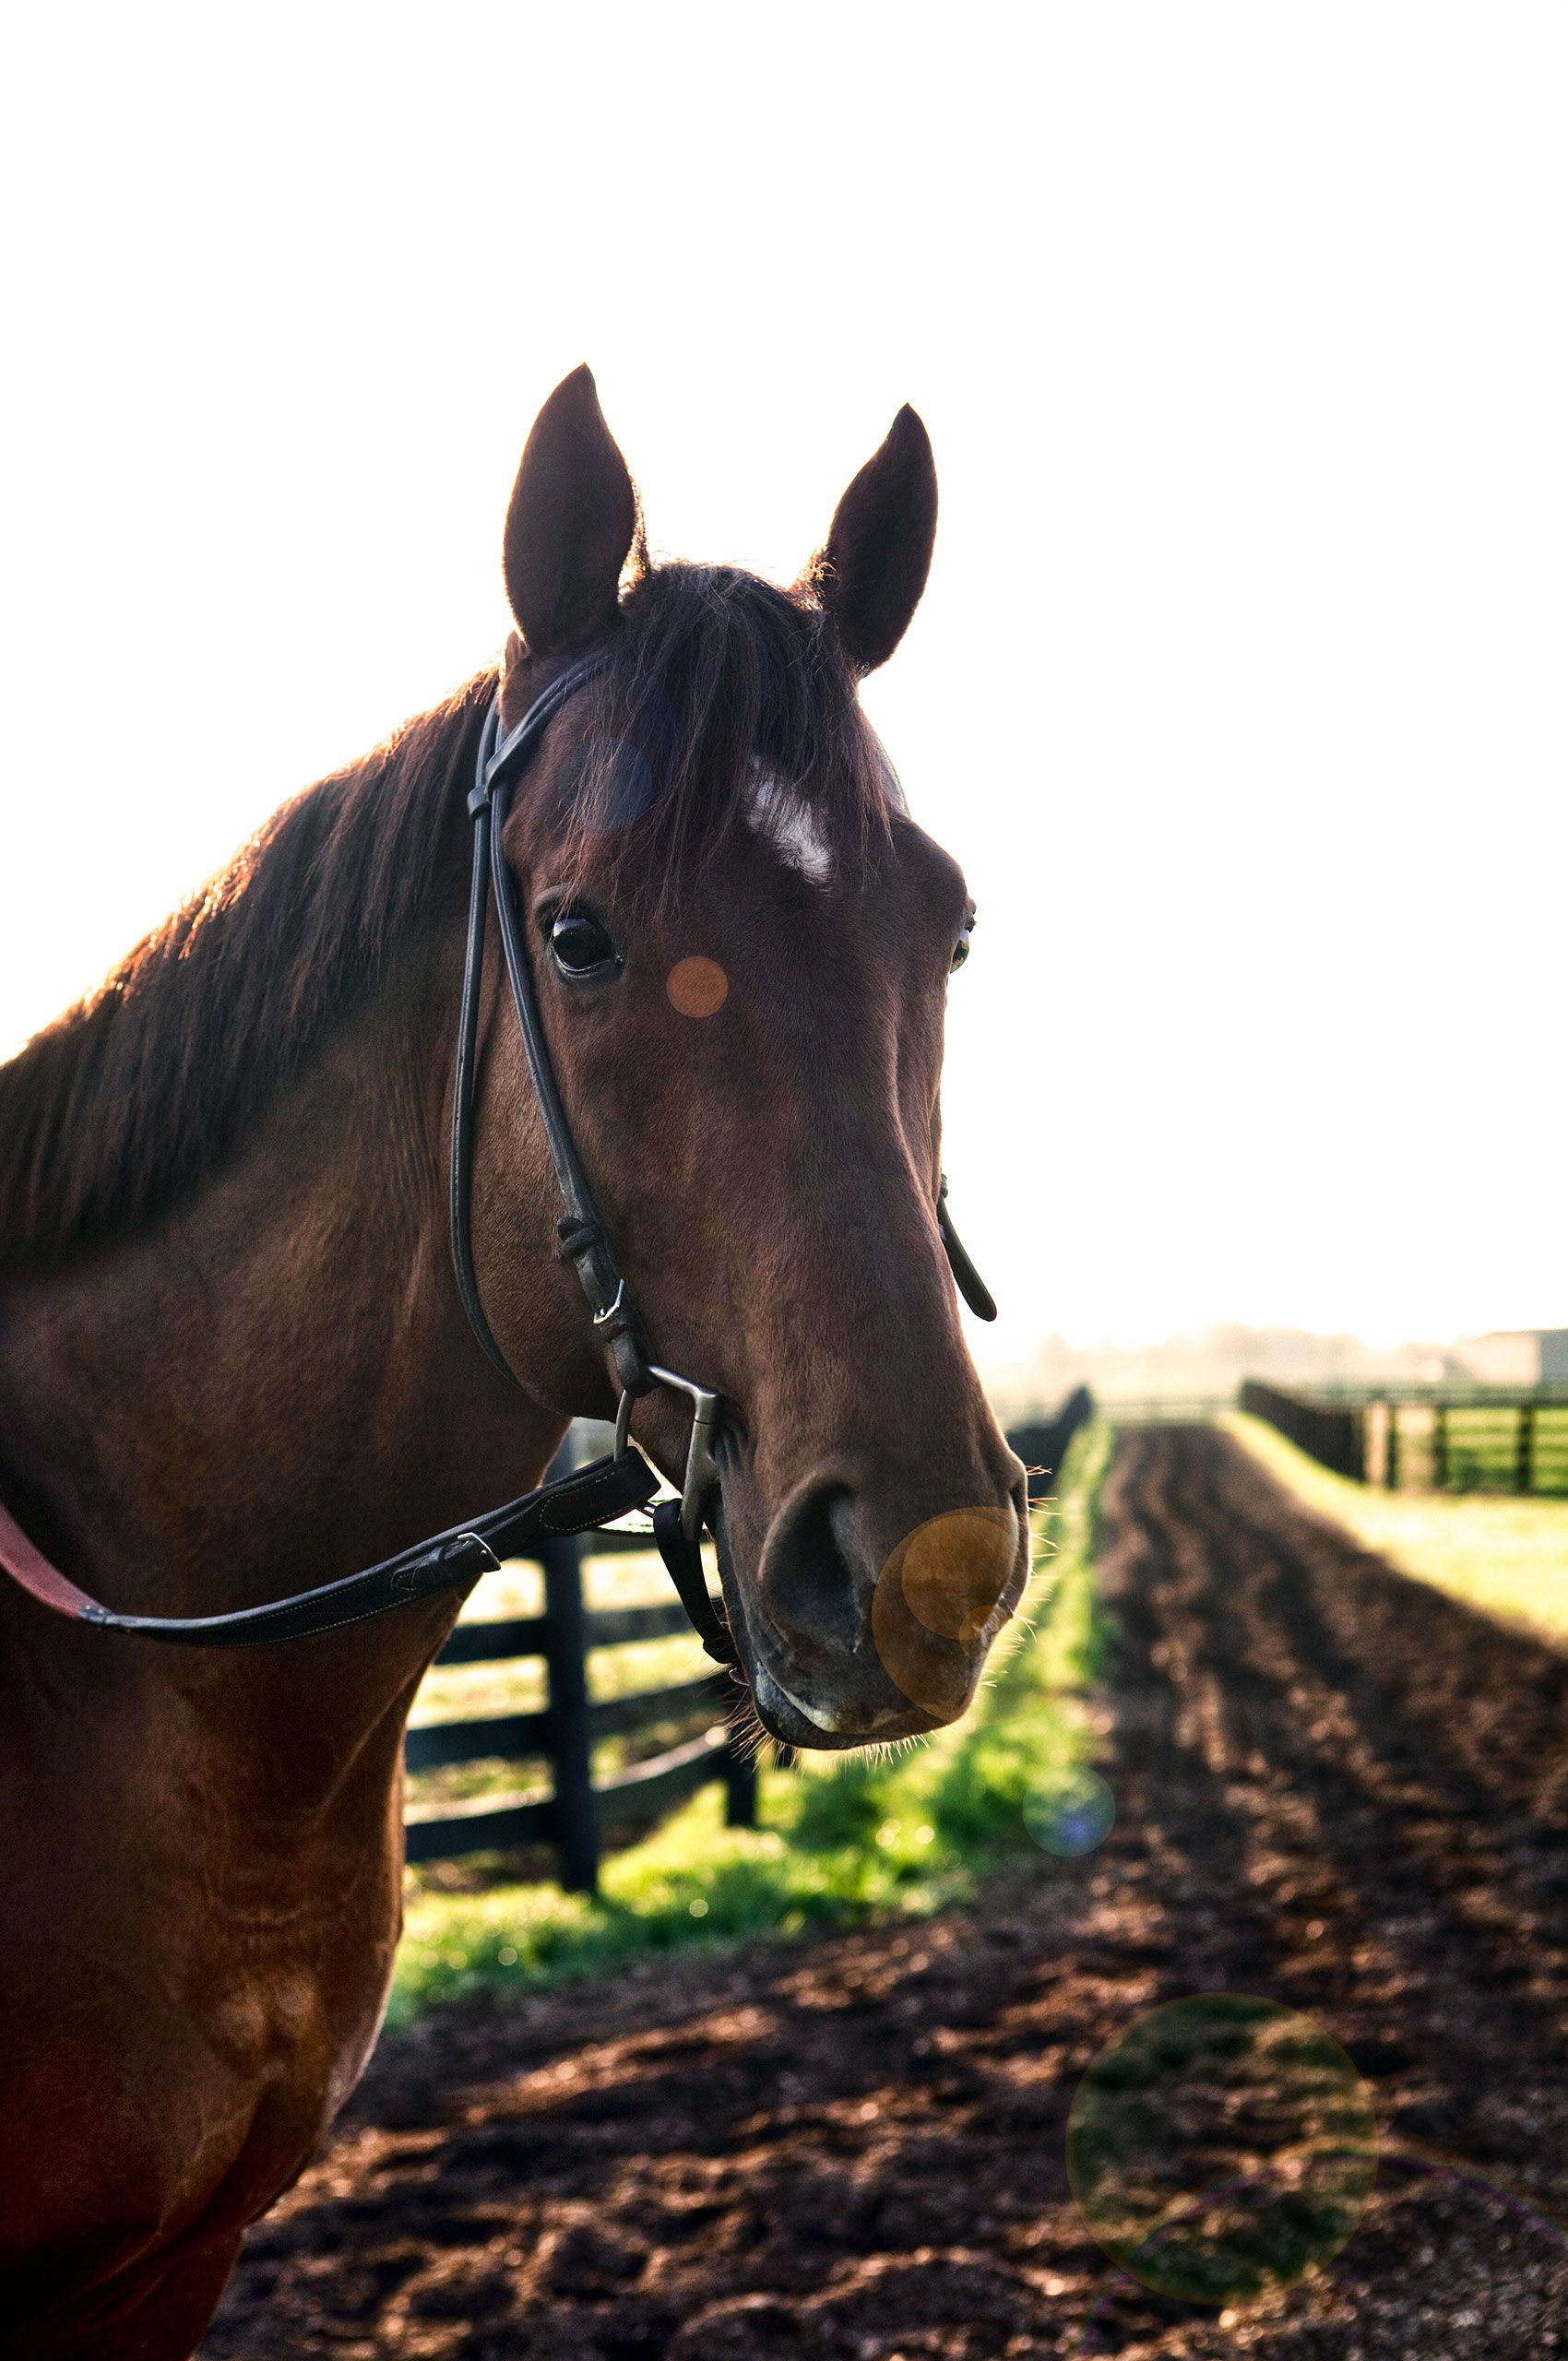 Horse-portrait-HenrikOlundPhotography.jpg